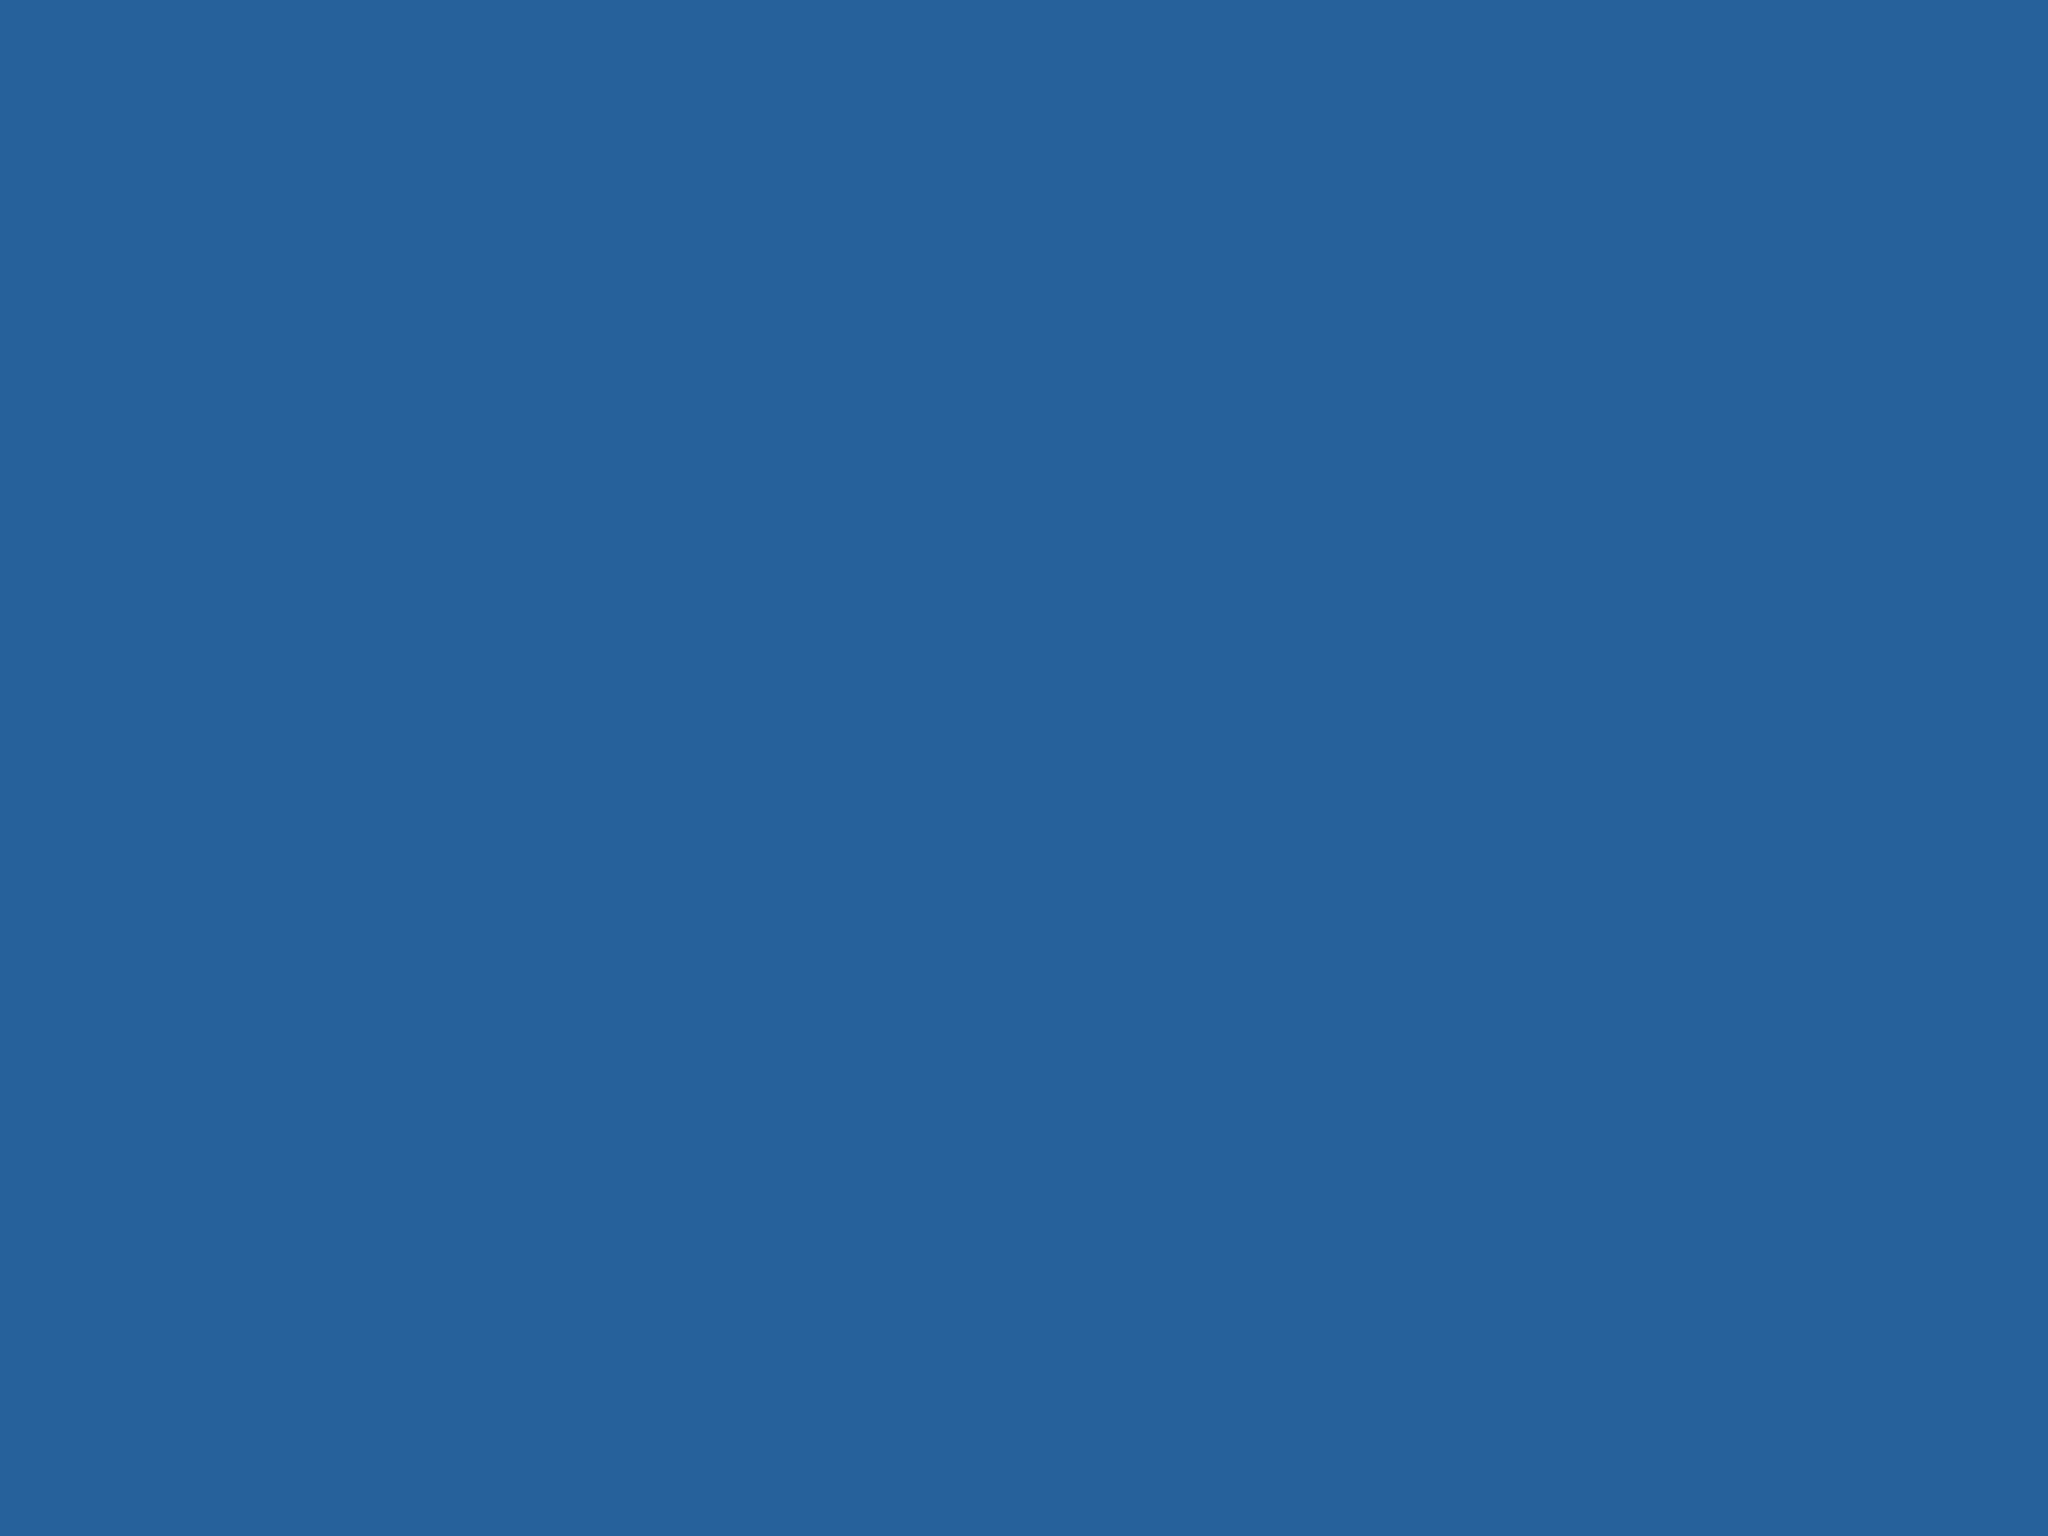 2048x1536 Lapis Lazuli Solid Color Background